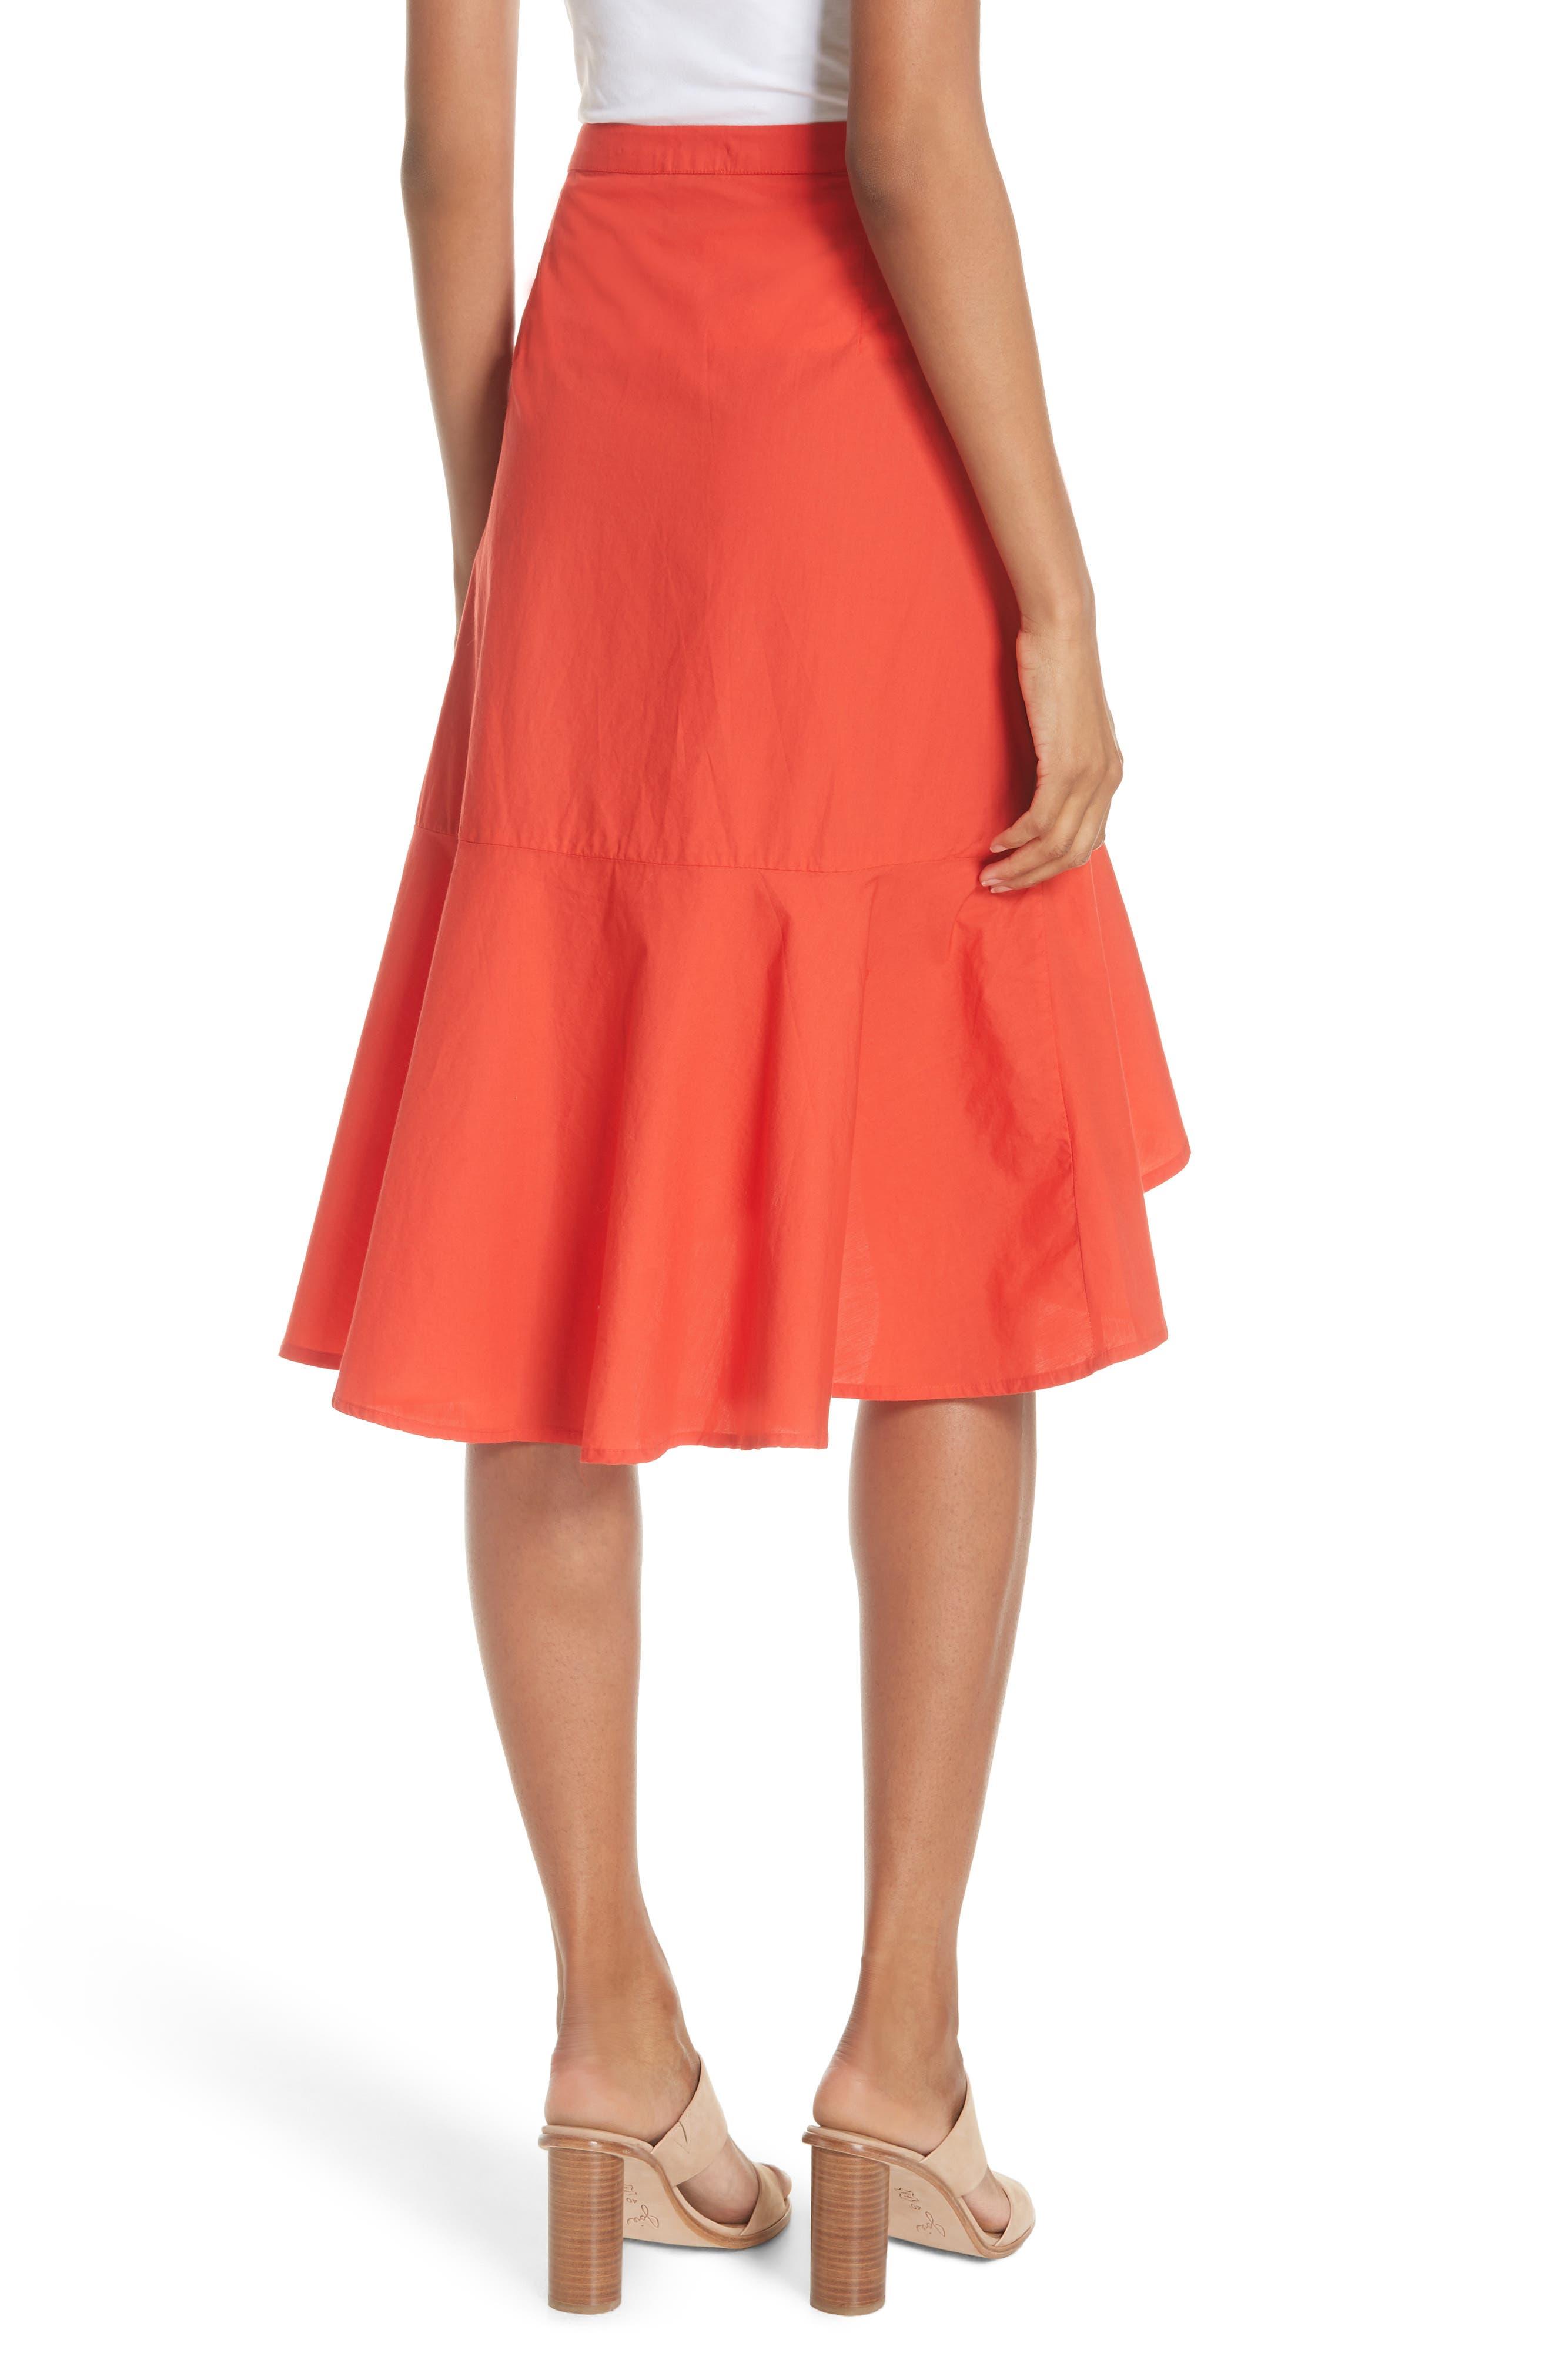 Chesmu Ruffled Cotton Skirt,                             Alternate thumbnail 2, color,                             Salsa